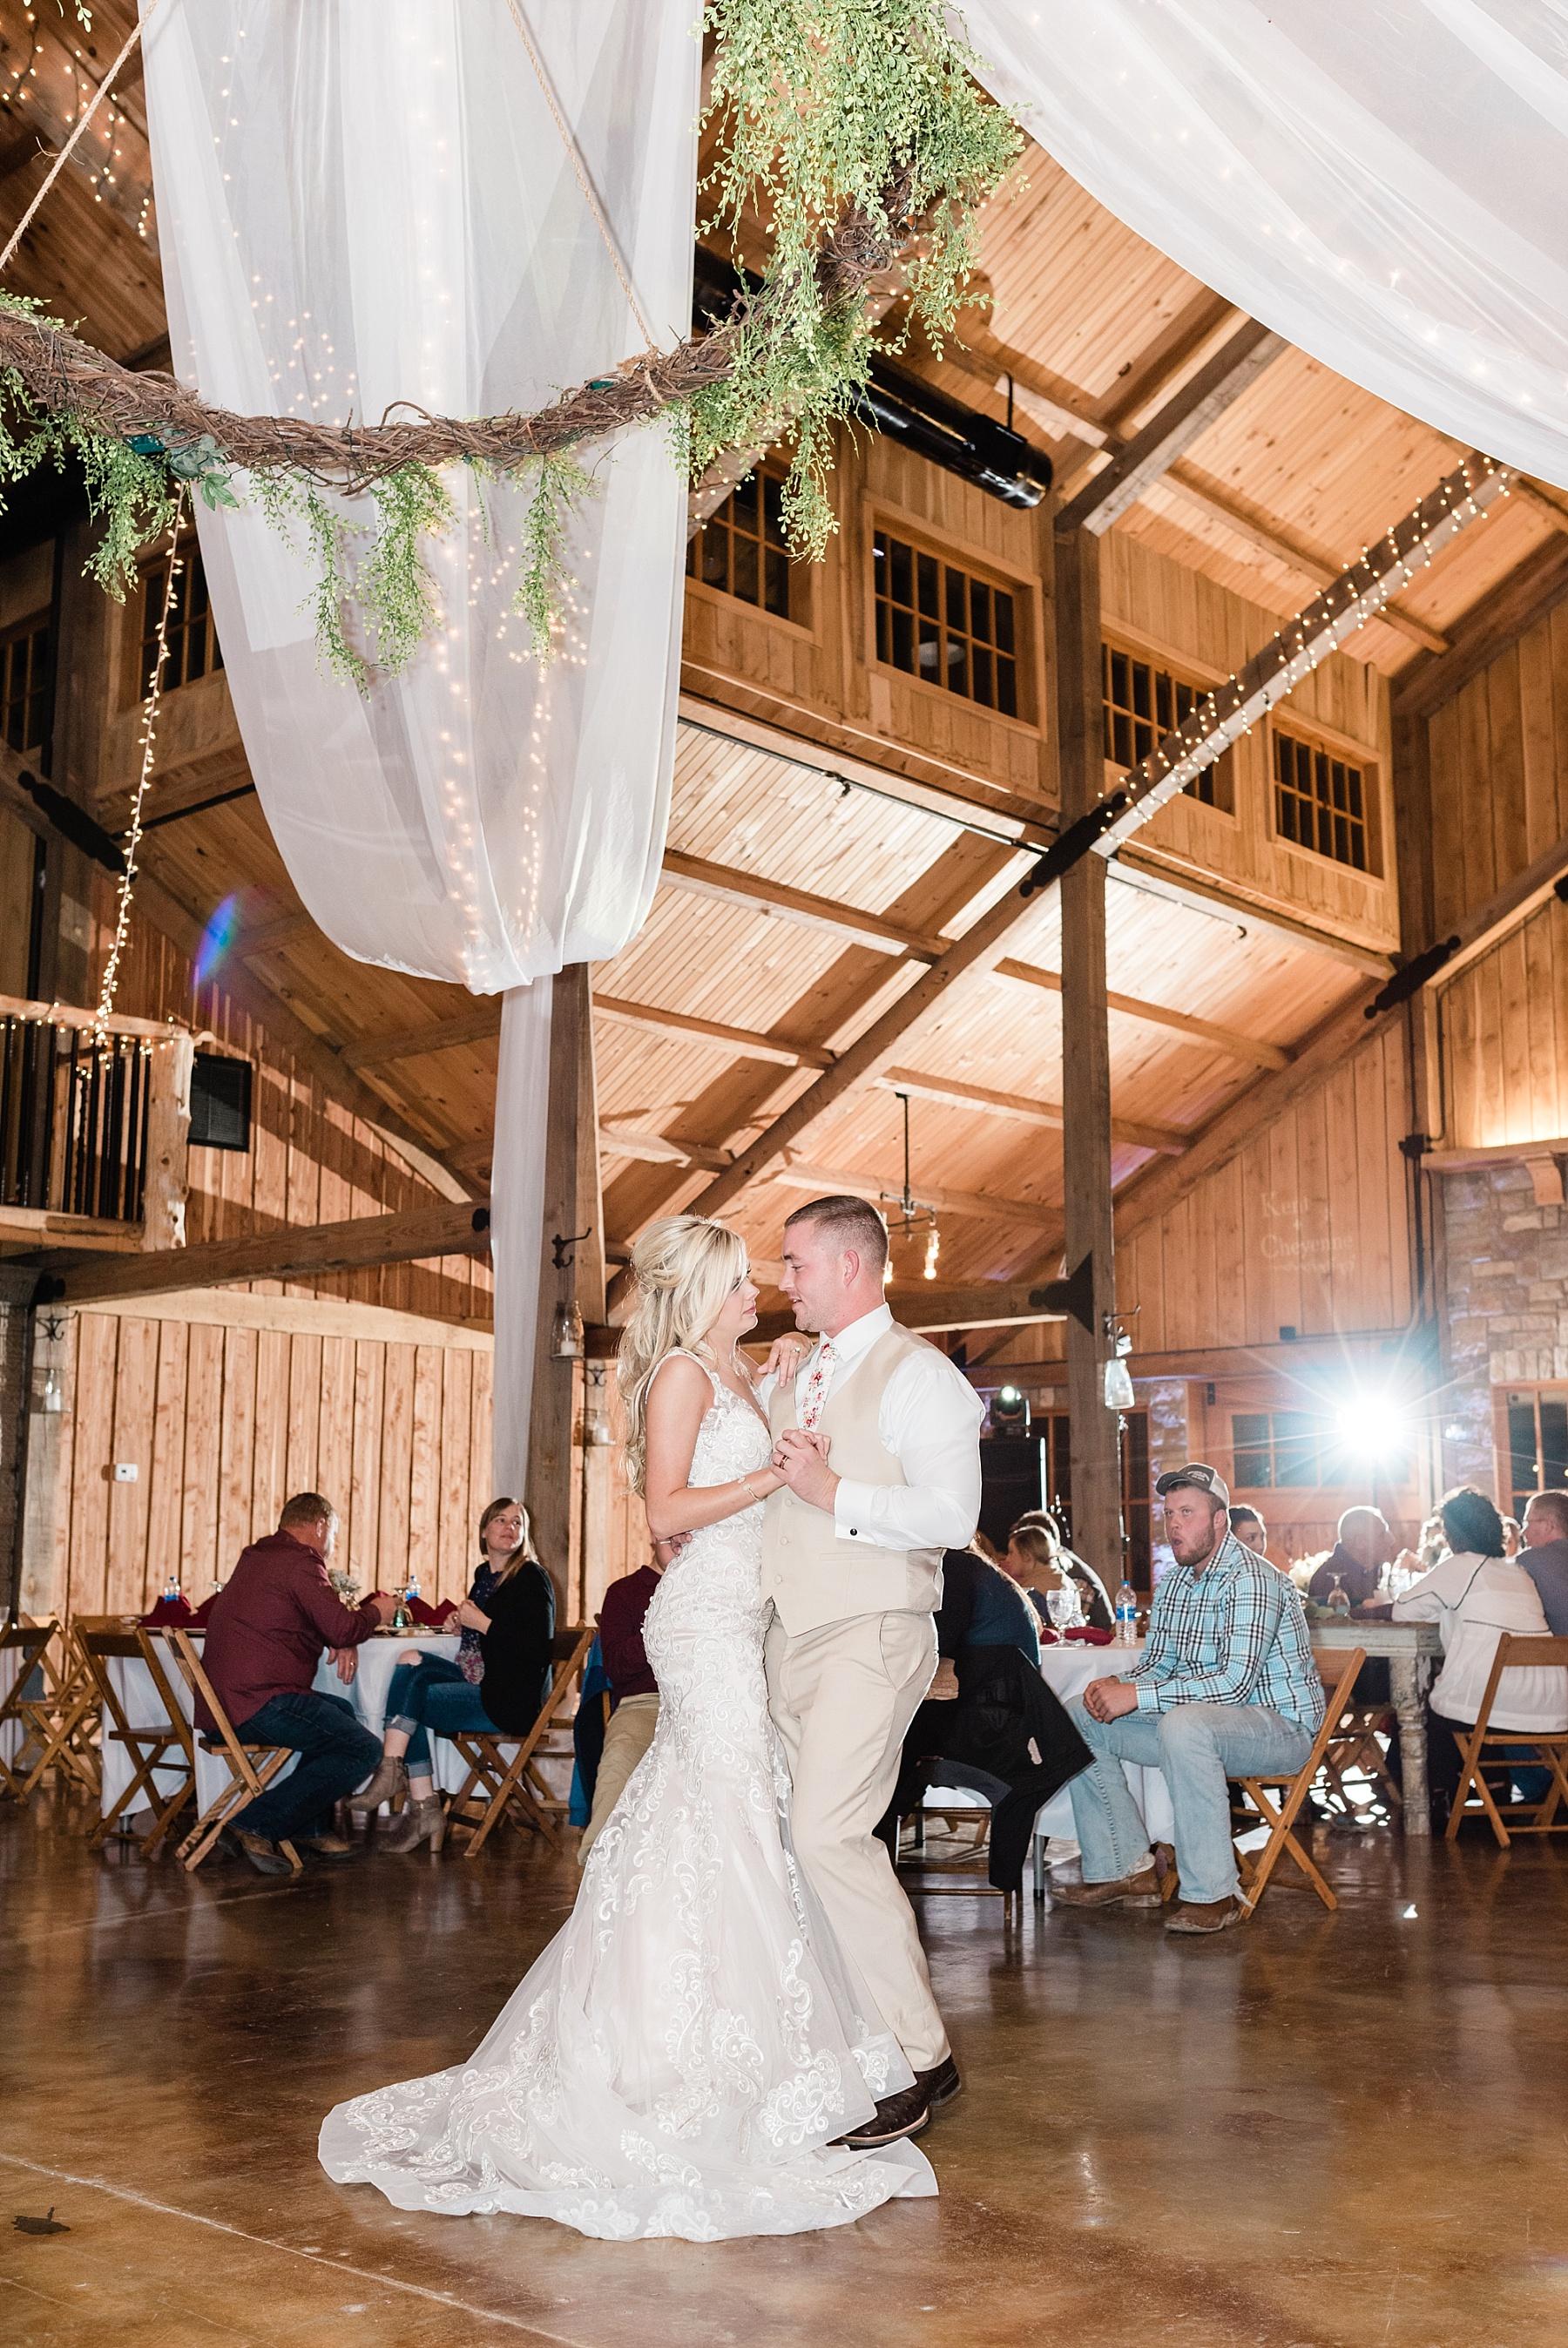 Lakeside Wedding in Fall at Mighty Oak Lodge by Misouri Wedding Photographer Kelsi Kliethermes Photography_0041.jpg